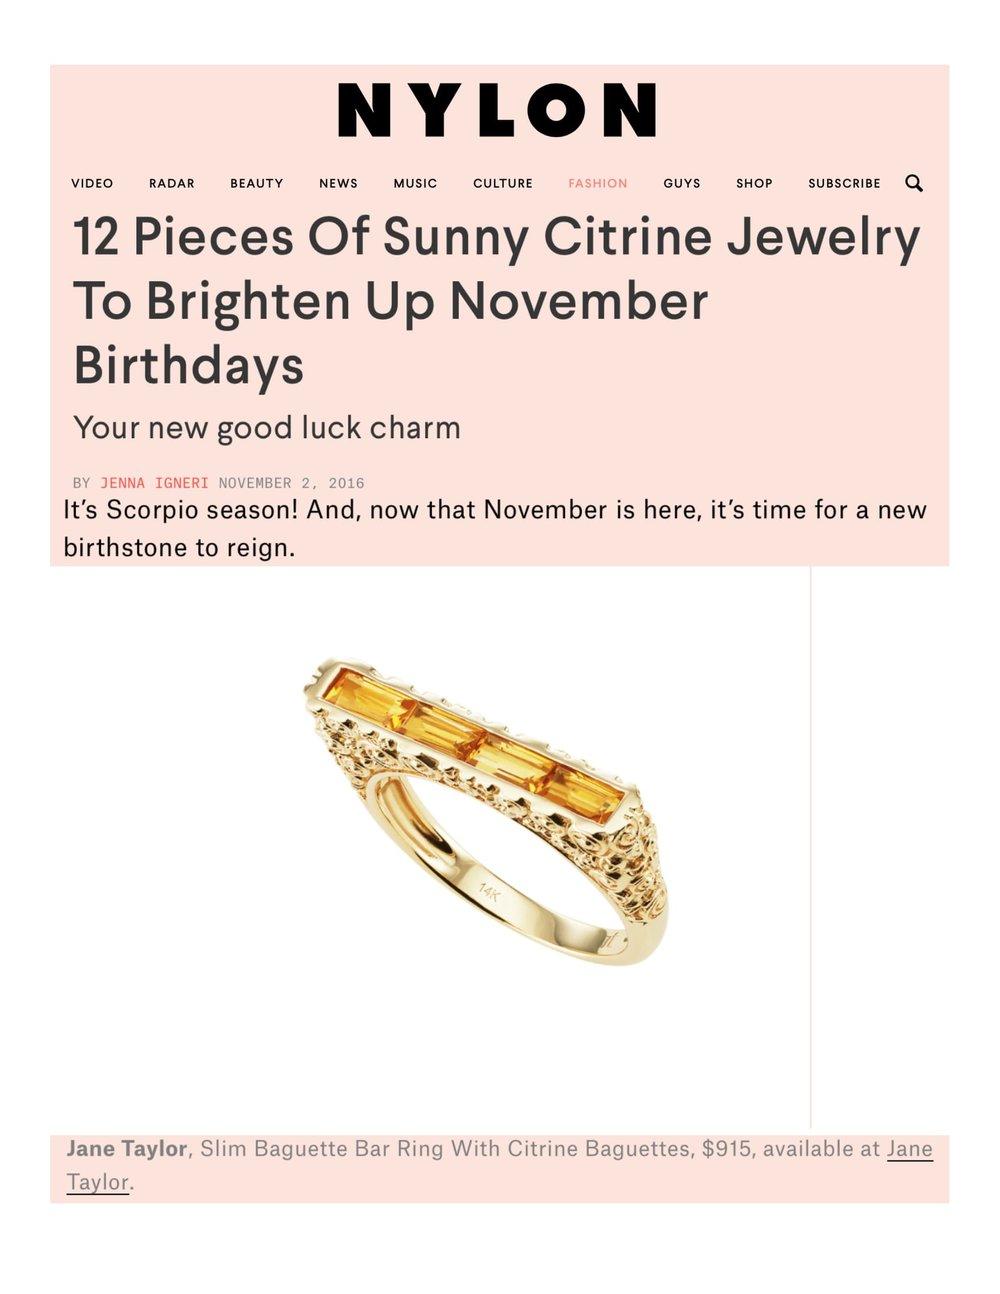 Nylon.com - Sunny Citrine Jewelry - Jane Taylor Jewelry